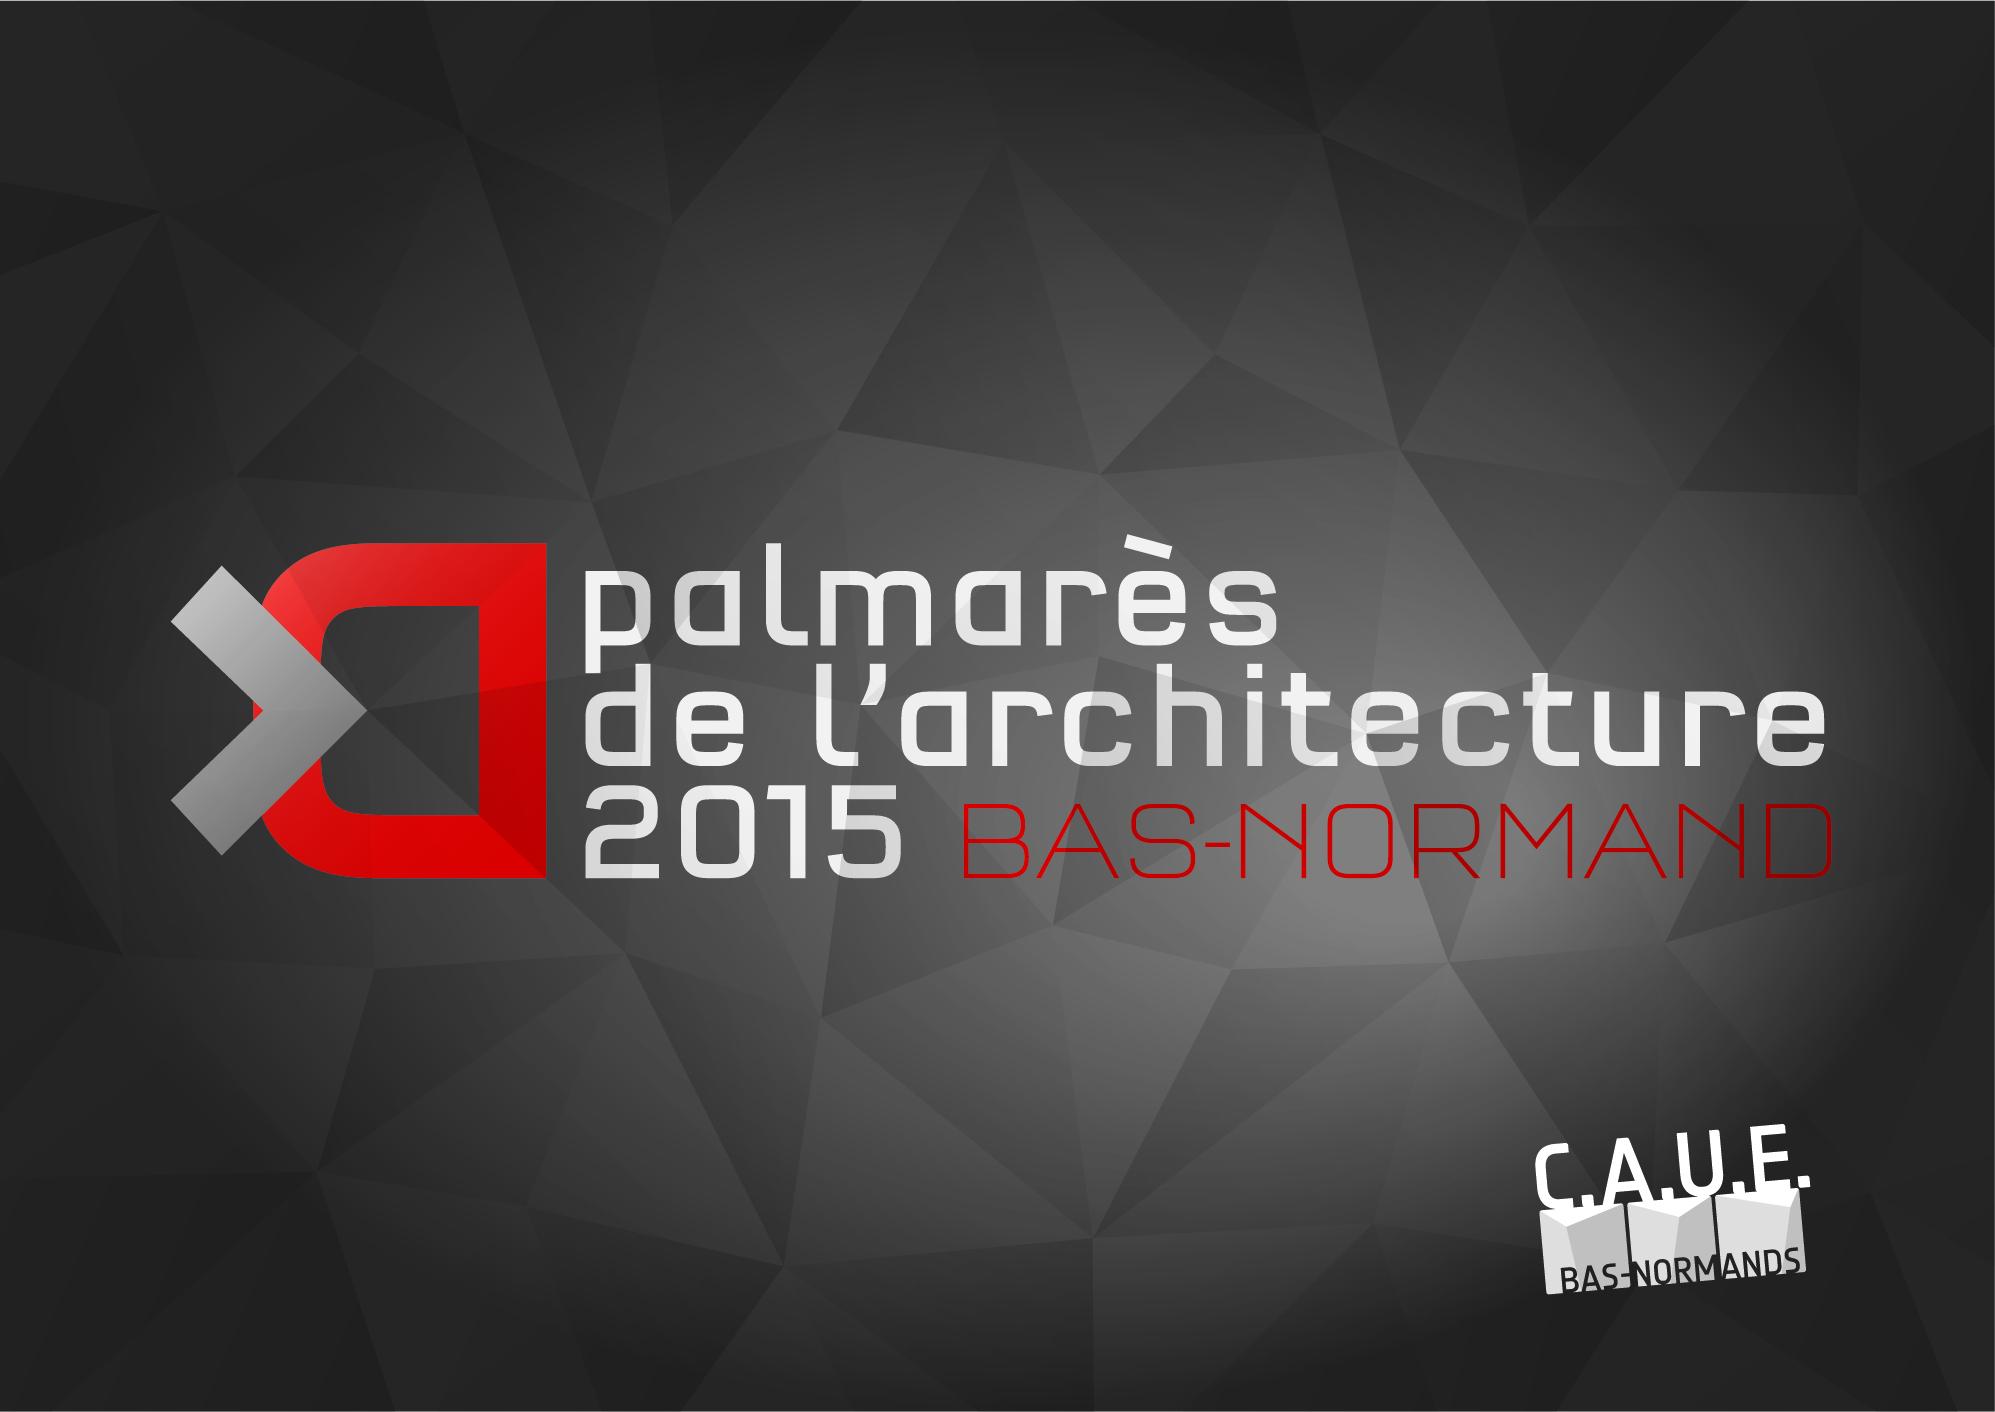 palma2015 BAS-NORMAND